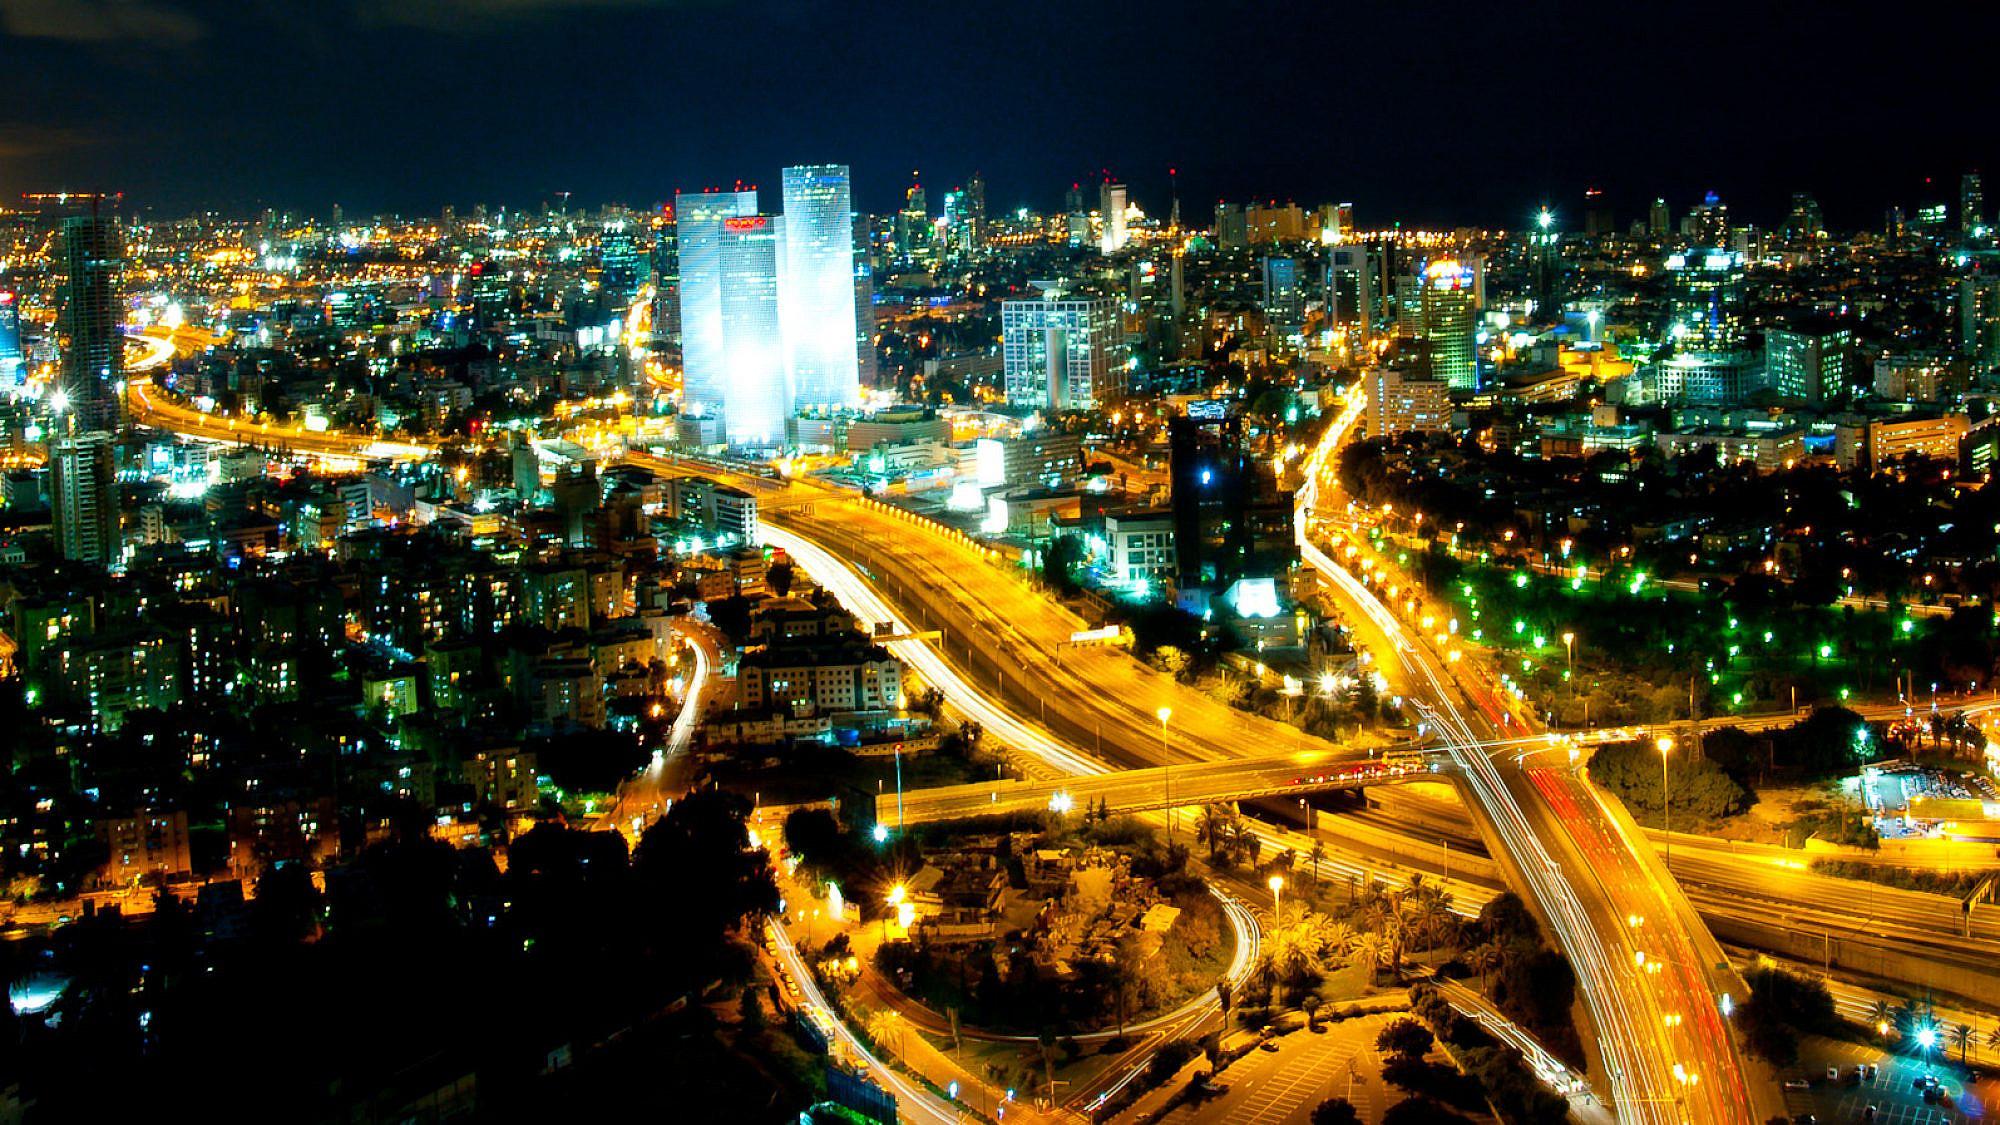 The skyline of Tel Aviv, home to many Israeli startup companies. Credit: Gilad Avidan/Wikimedia Commons.